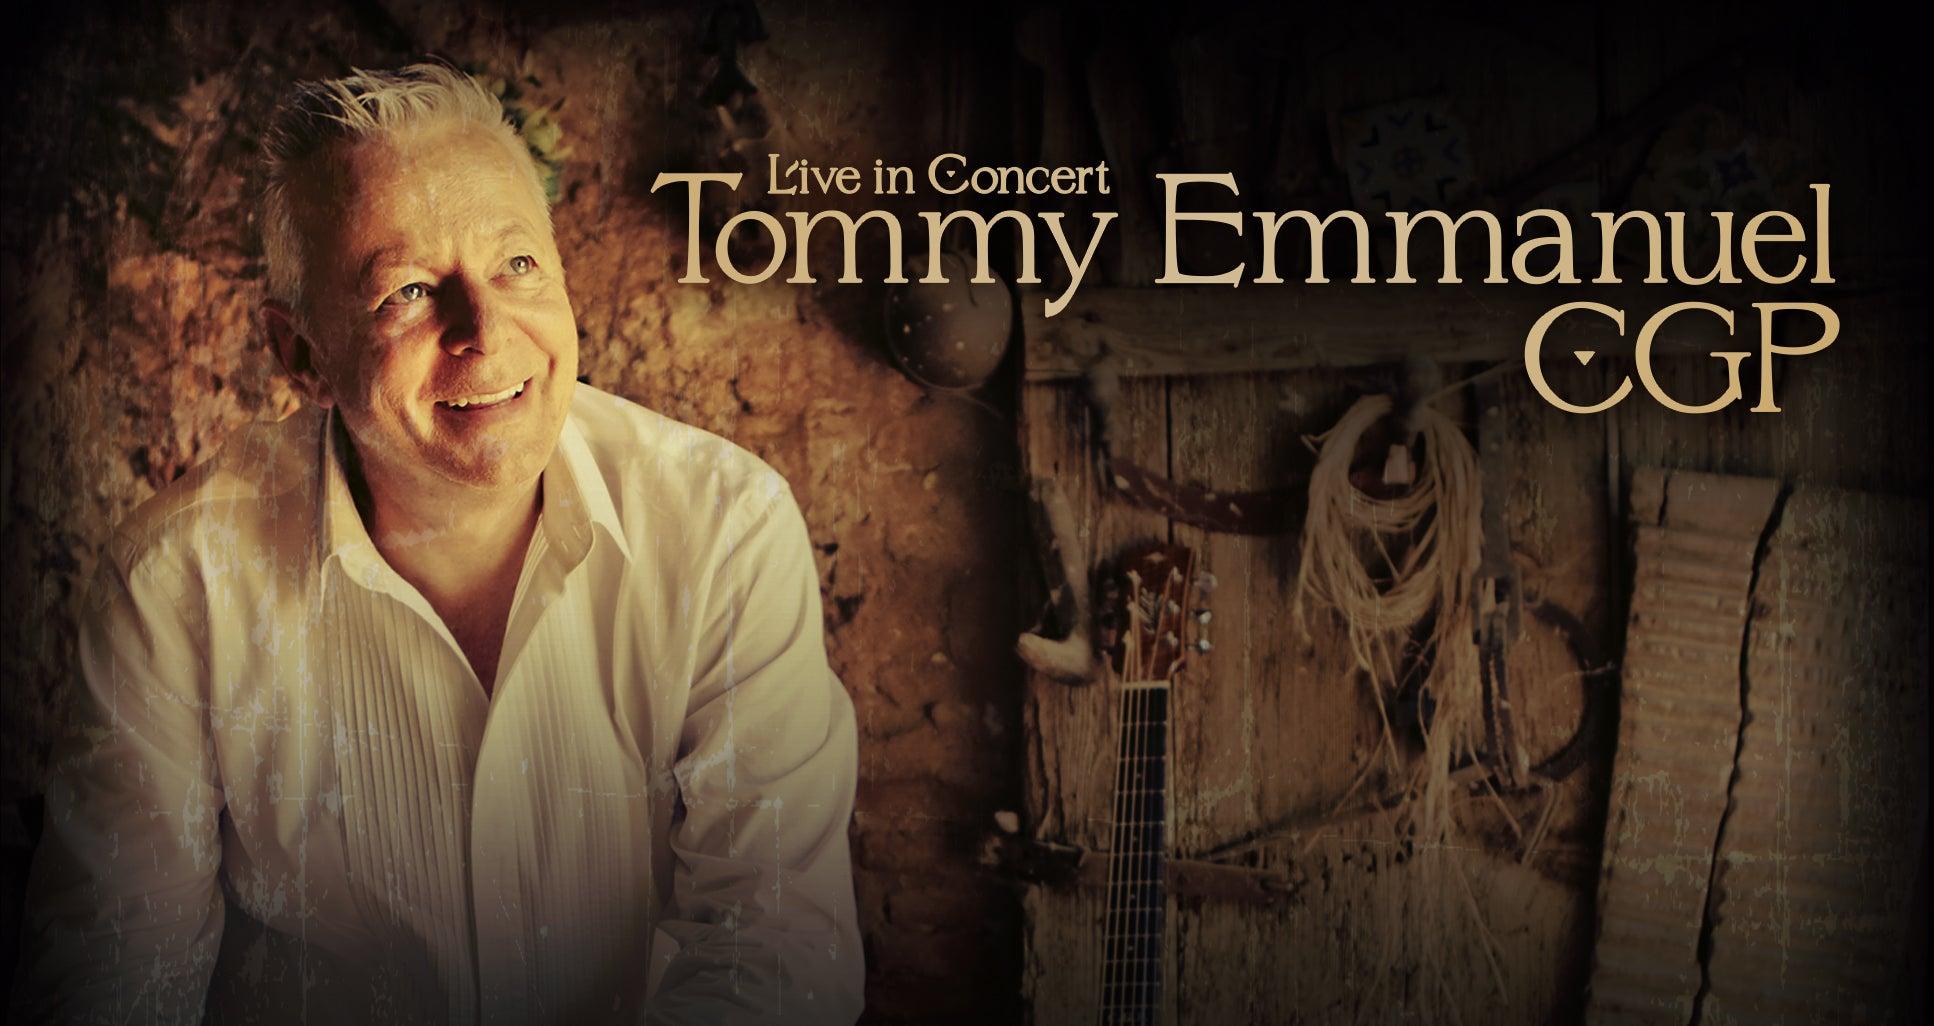 Tommy Emmanuel, CGP